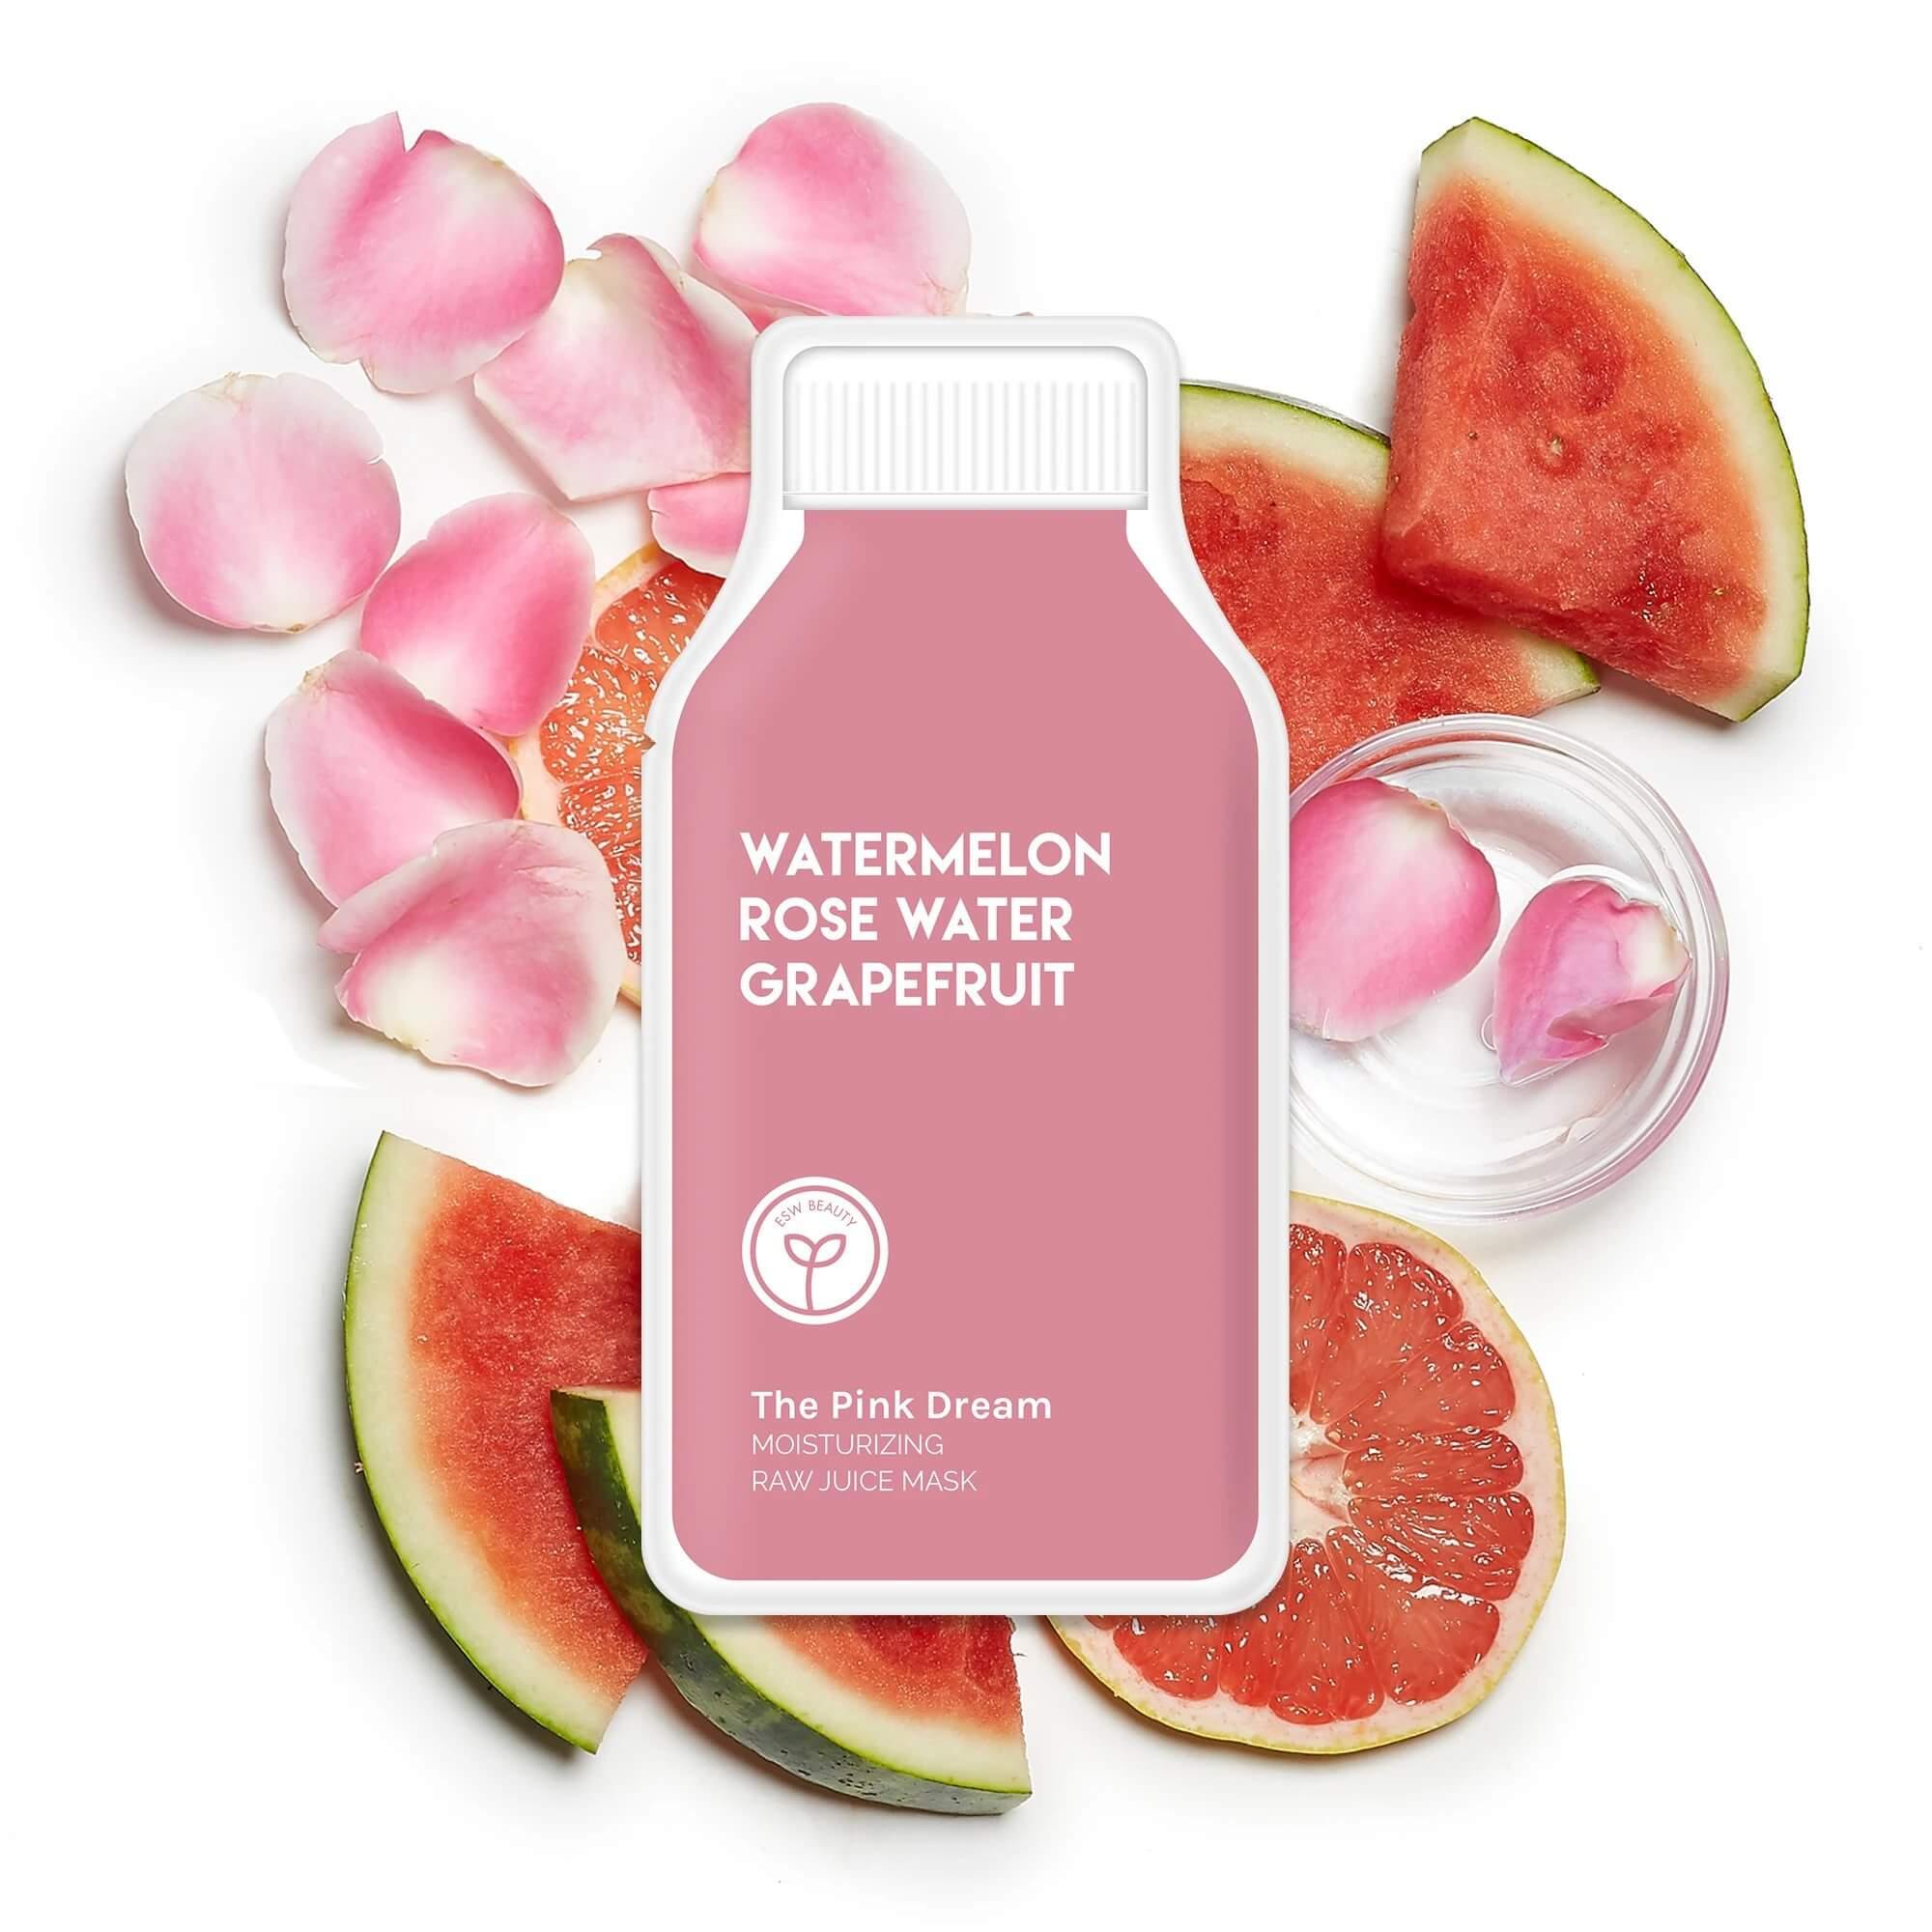 The Pink Dream Moisturizing Raw Juice Mask